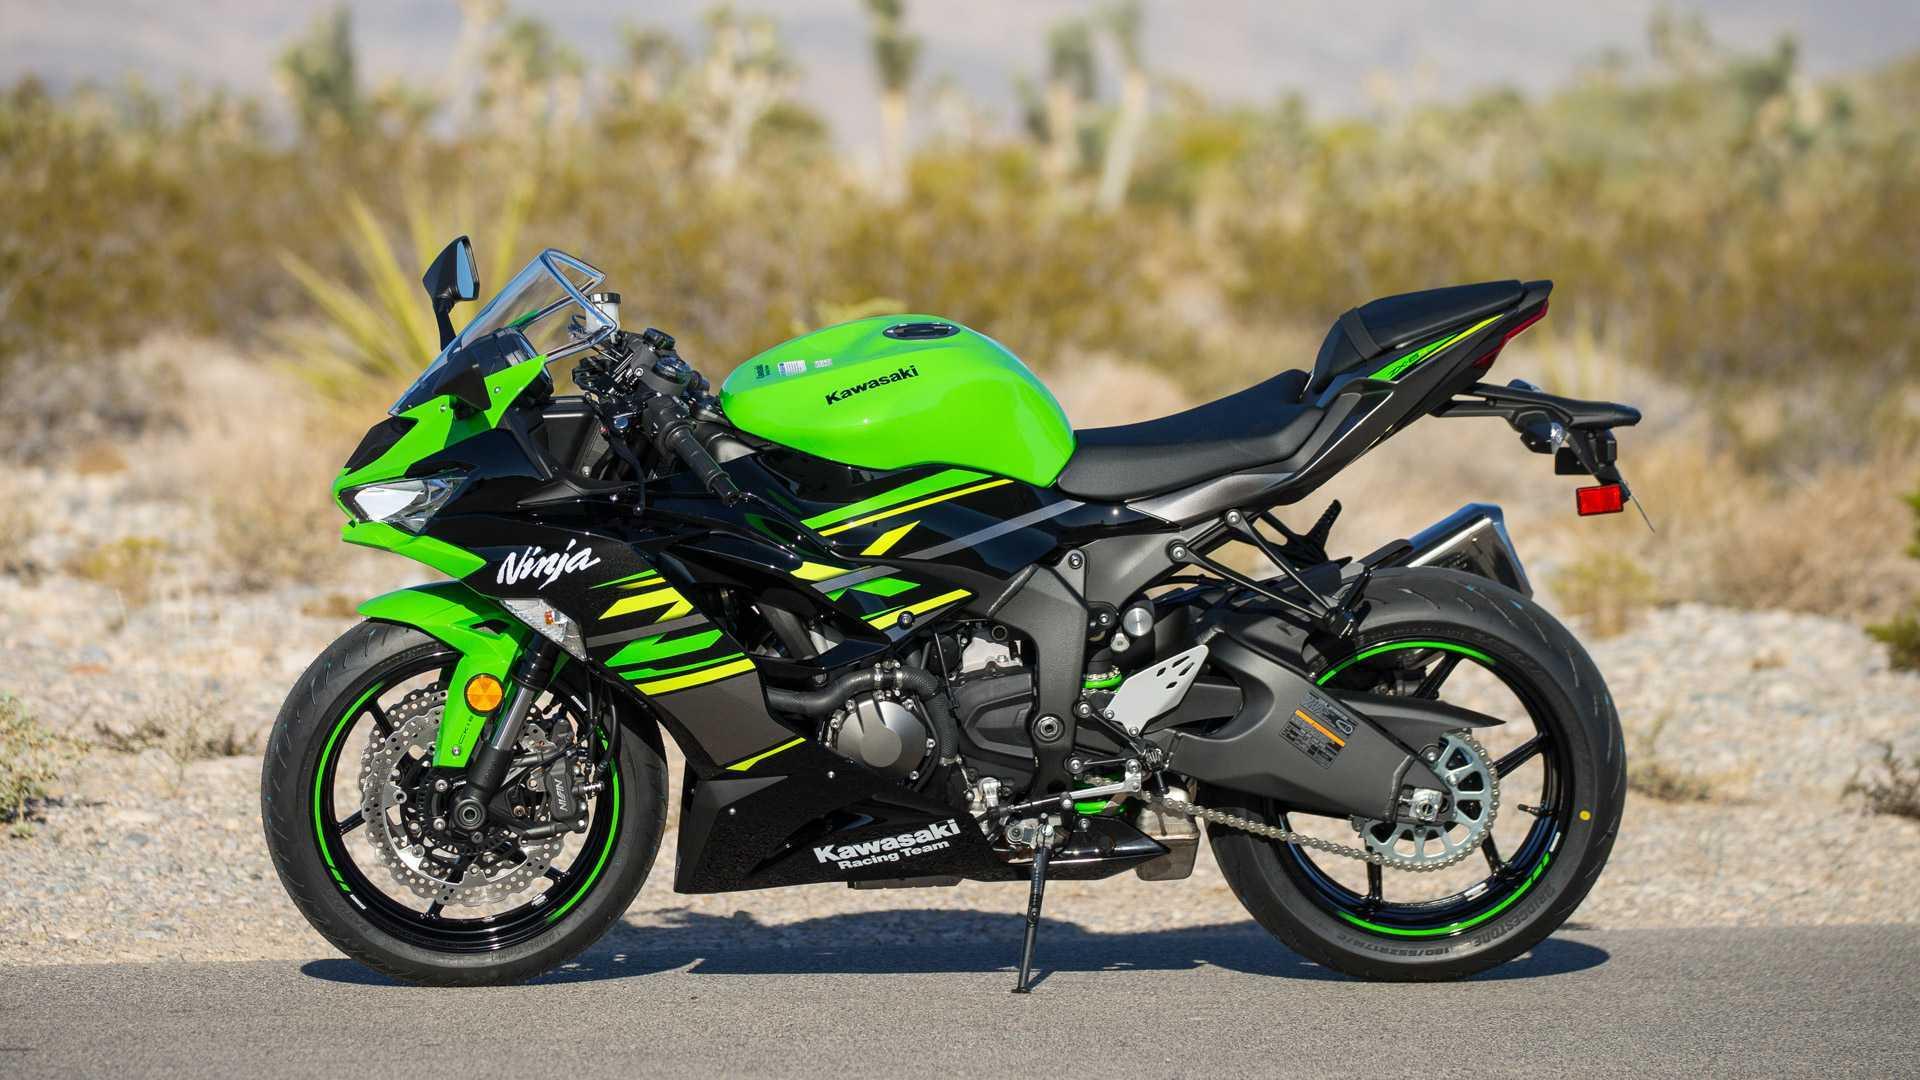 2019 Kawasaki Ninja Zx 6r Ride Like You Stole It